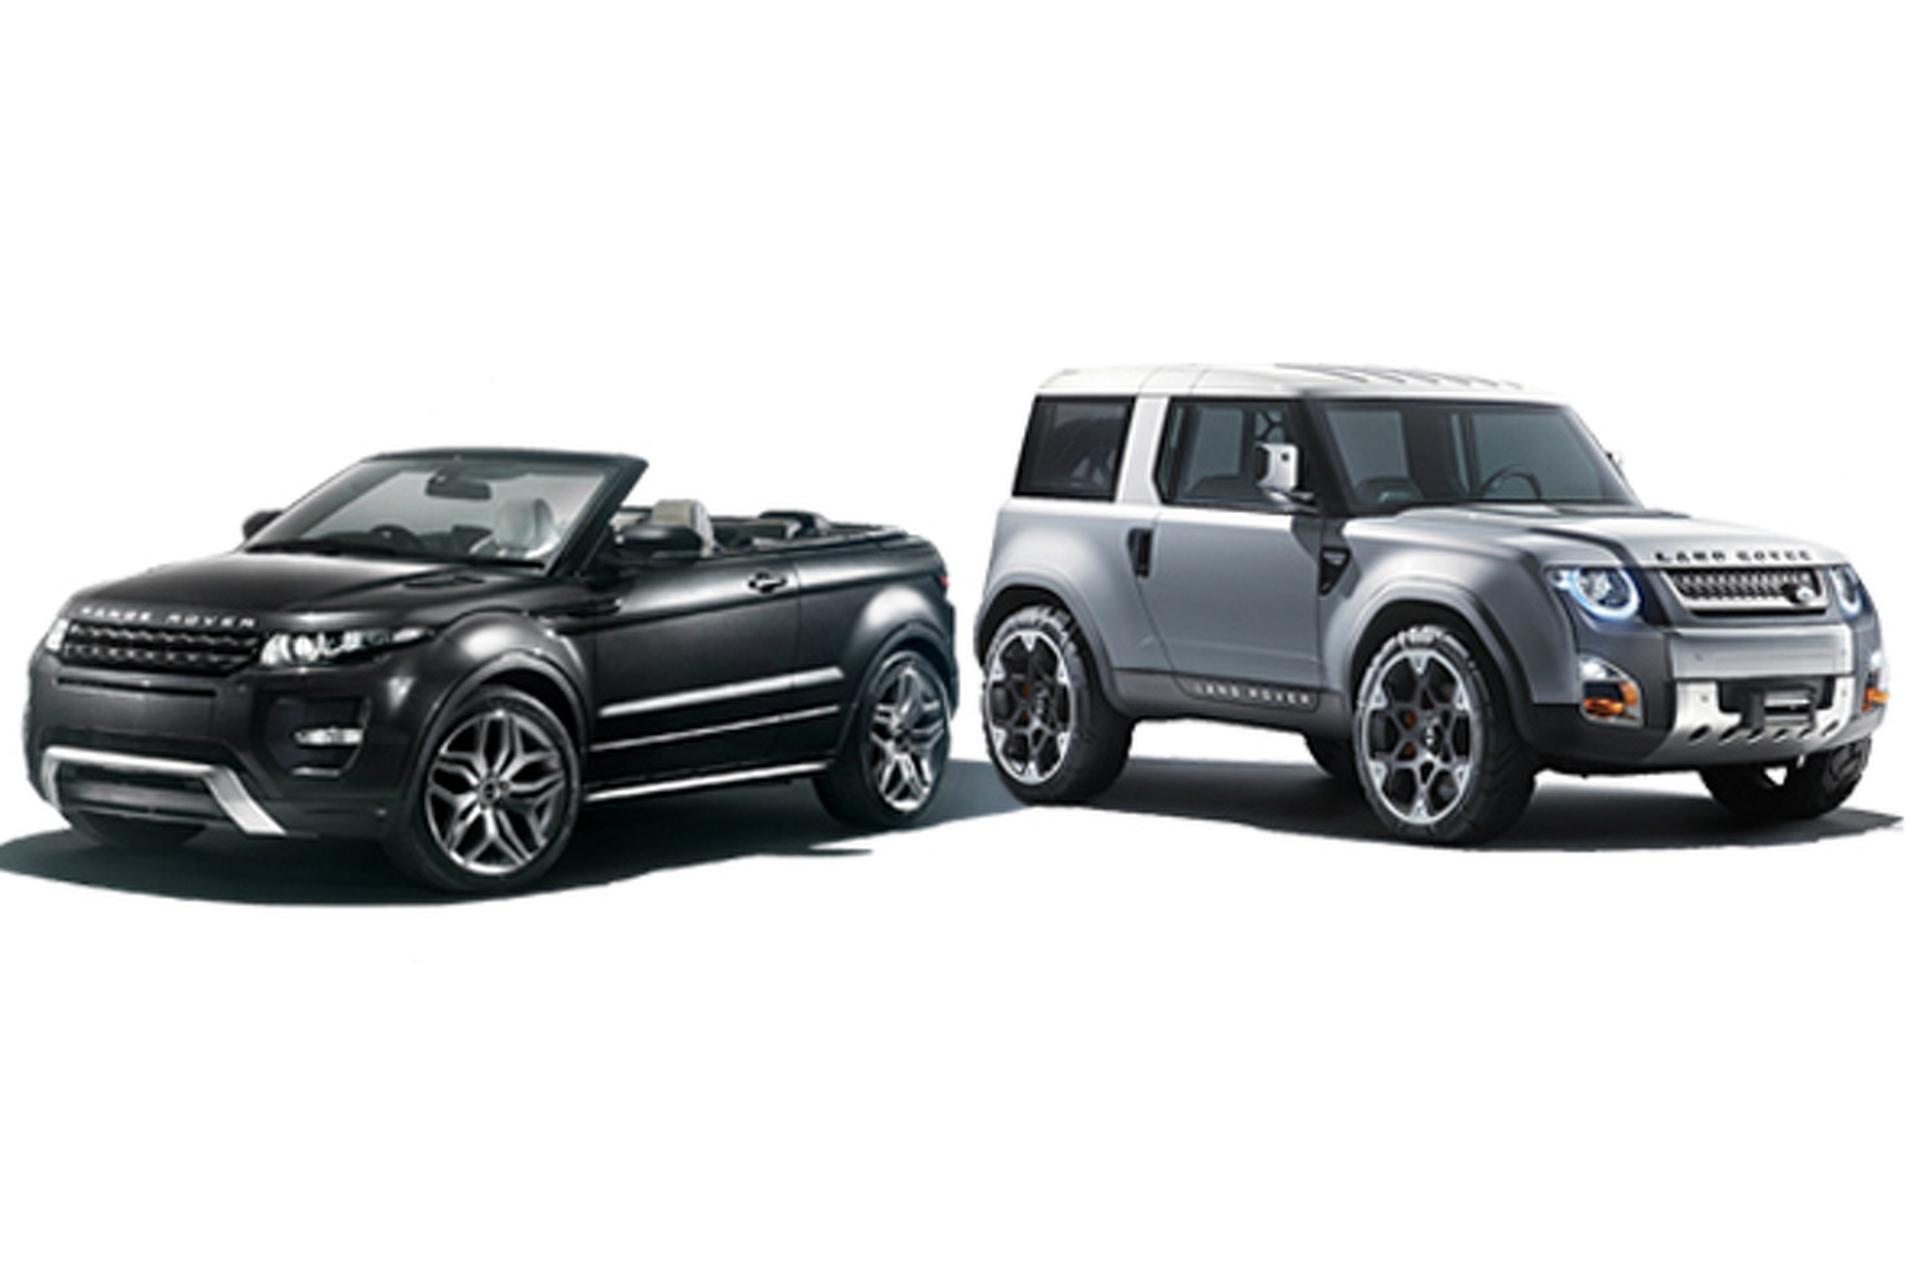 Future Rides Land Rover Evoque Convertible and DC100